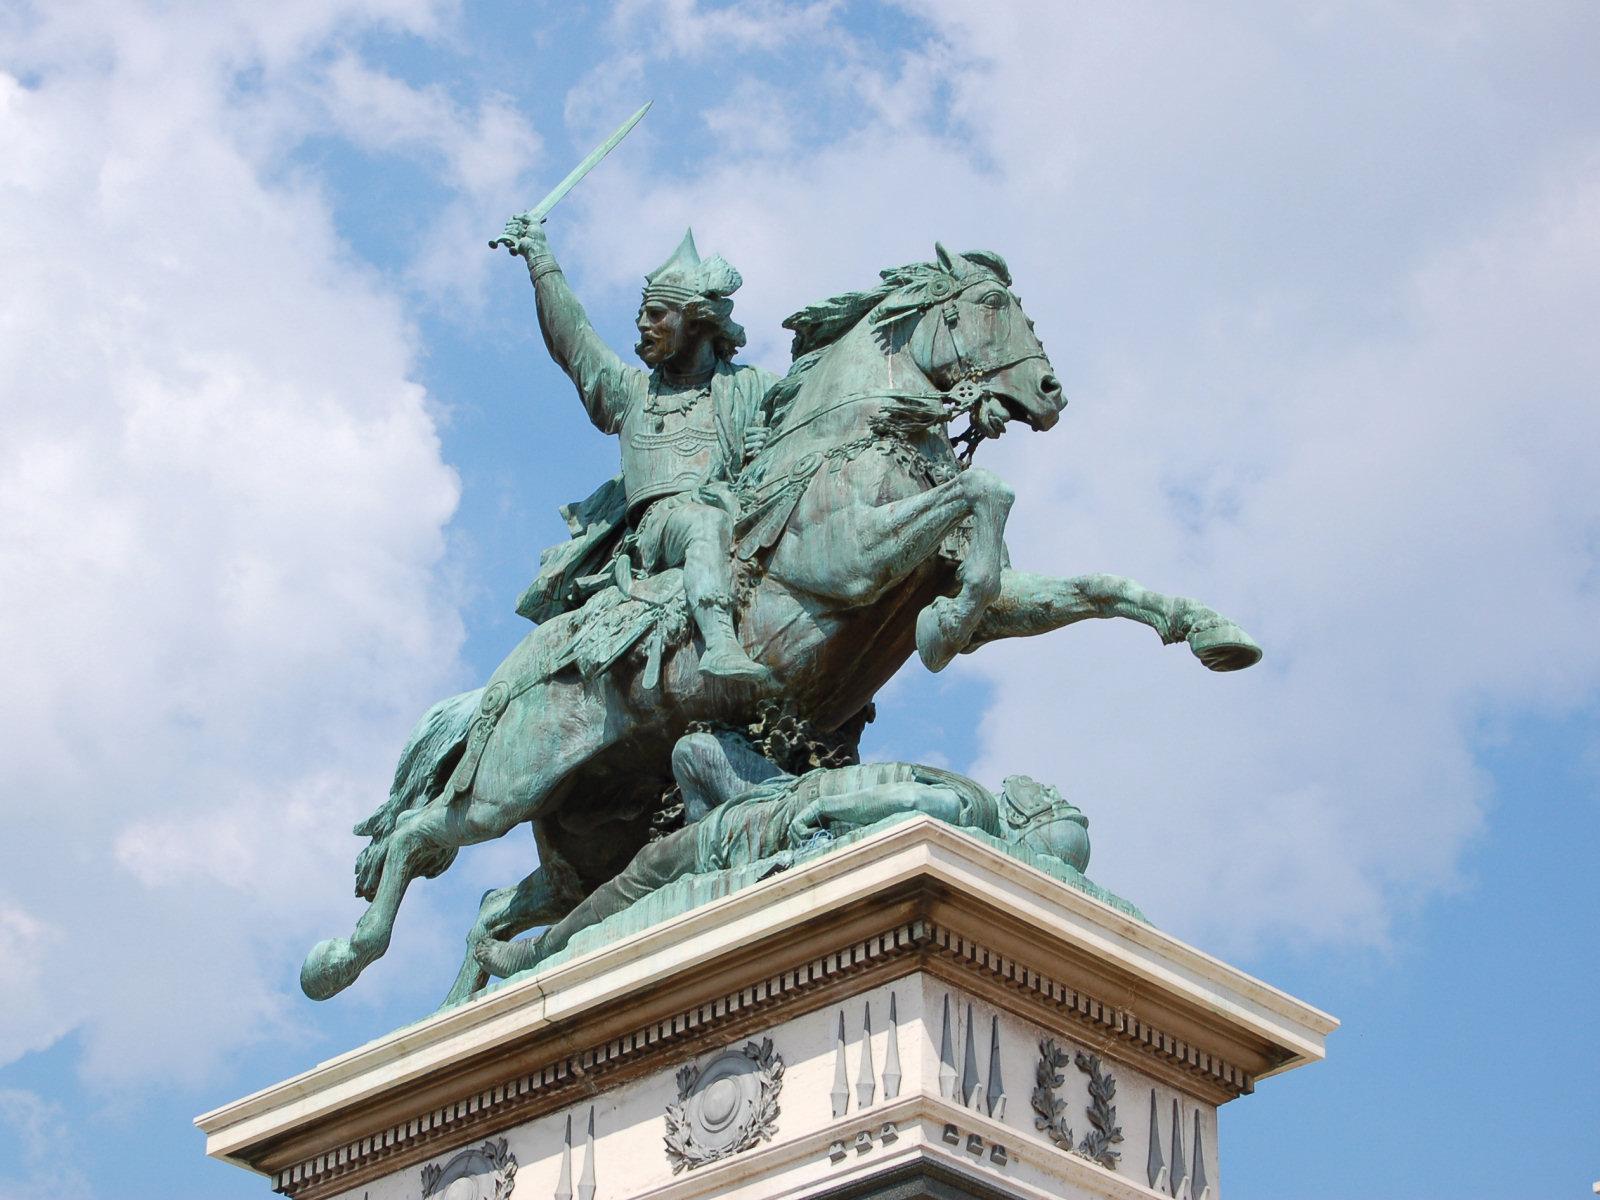 http://fr.academic.ru/pictures/frwiki/83/Statue-vercingetorix-jaude-clermont.jpg